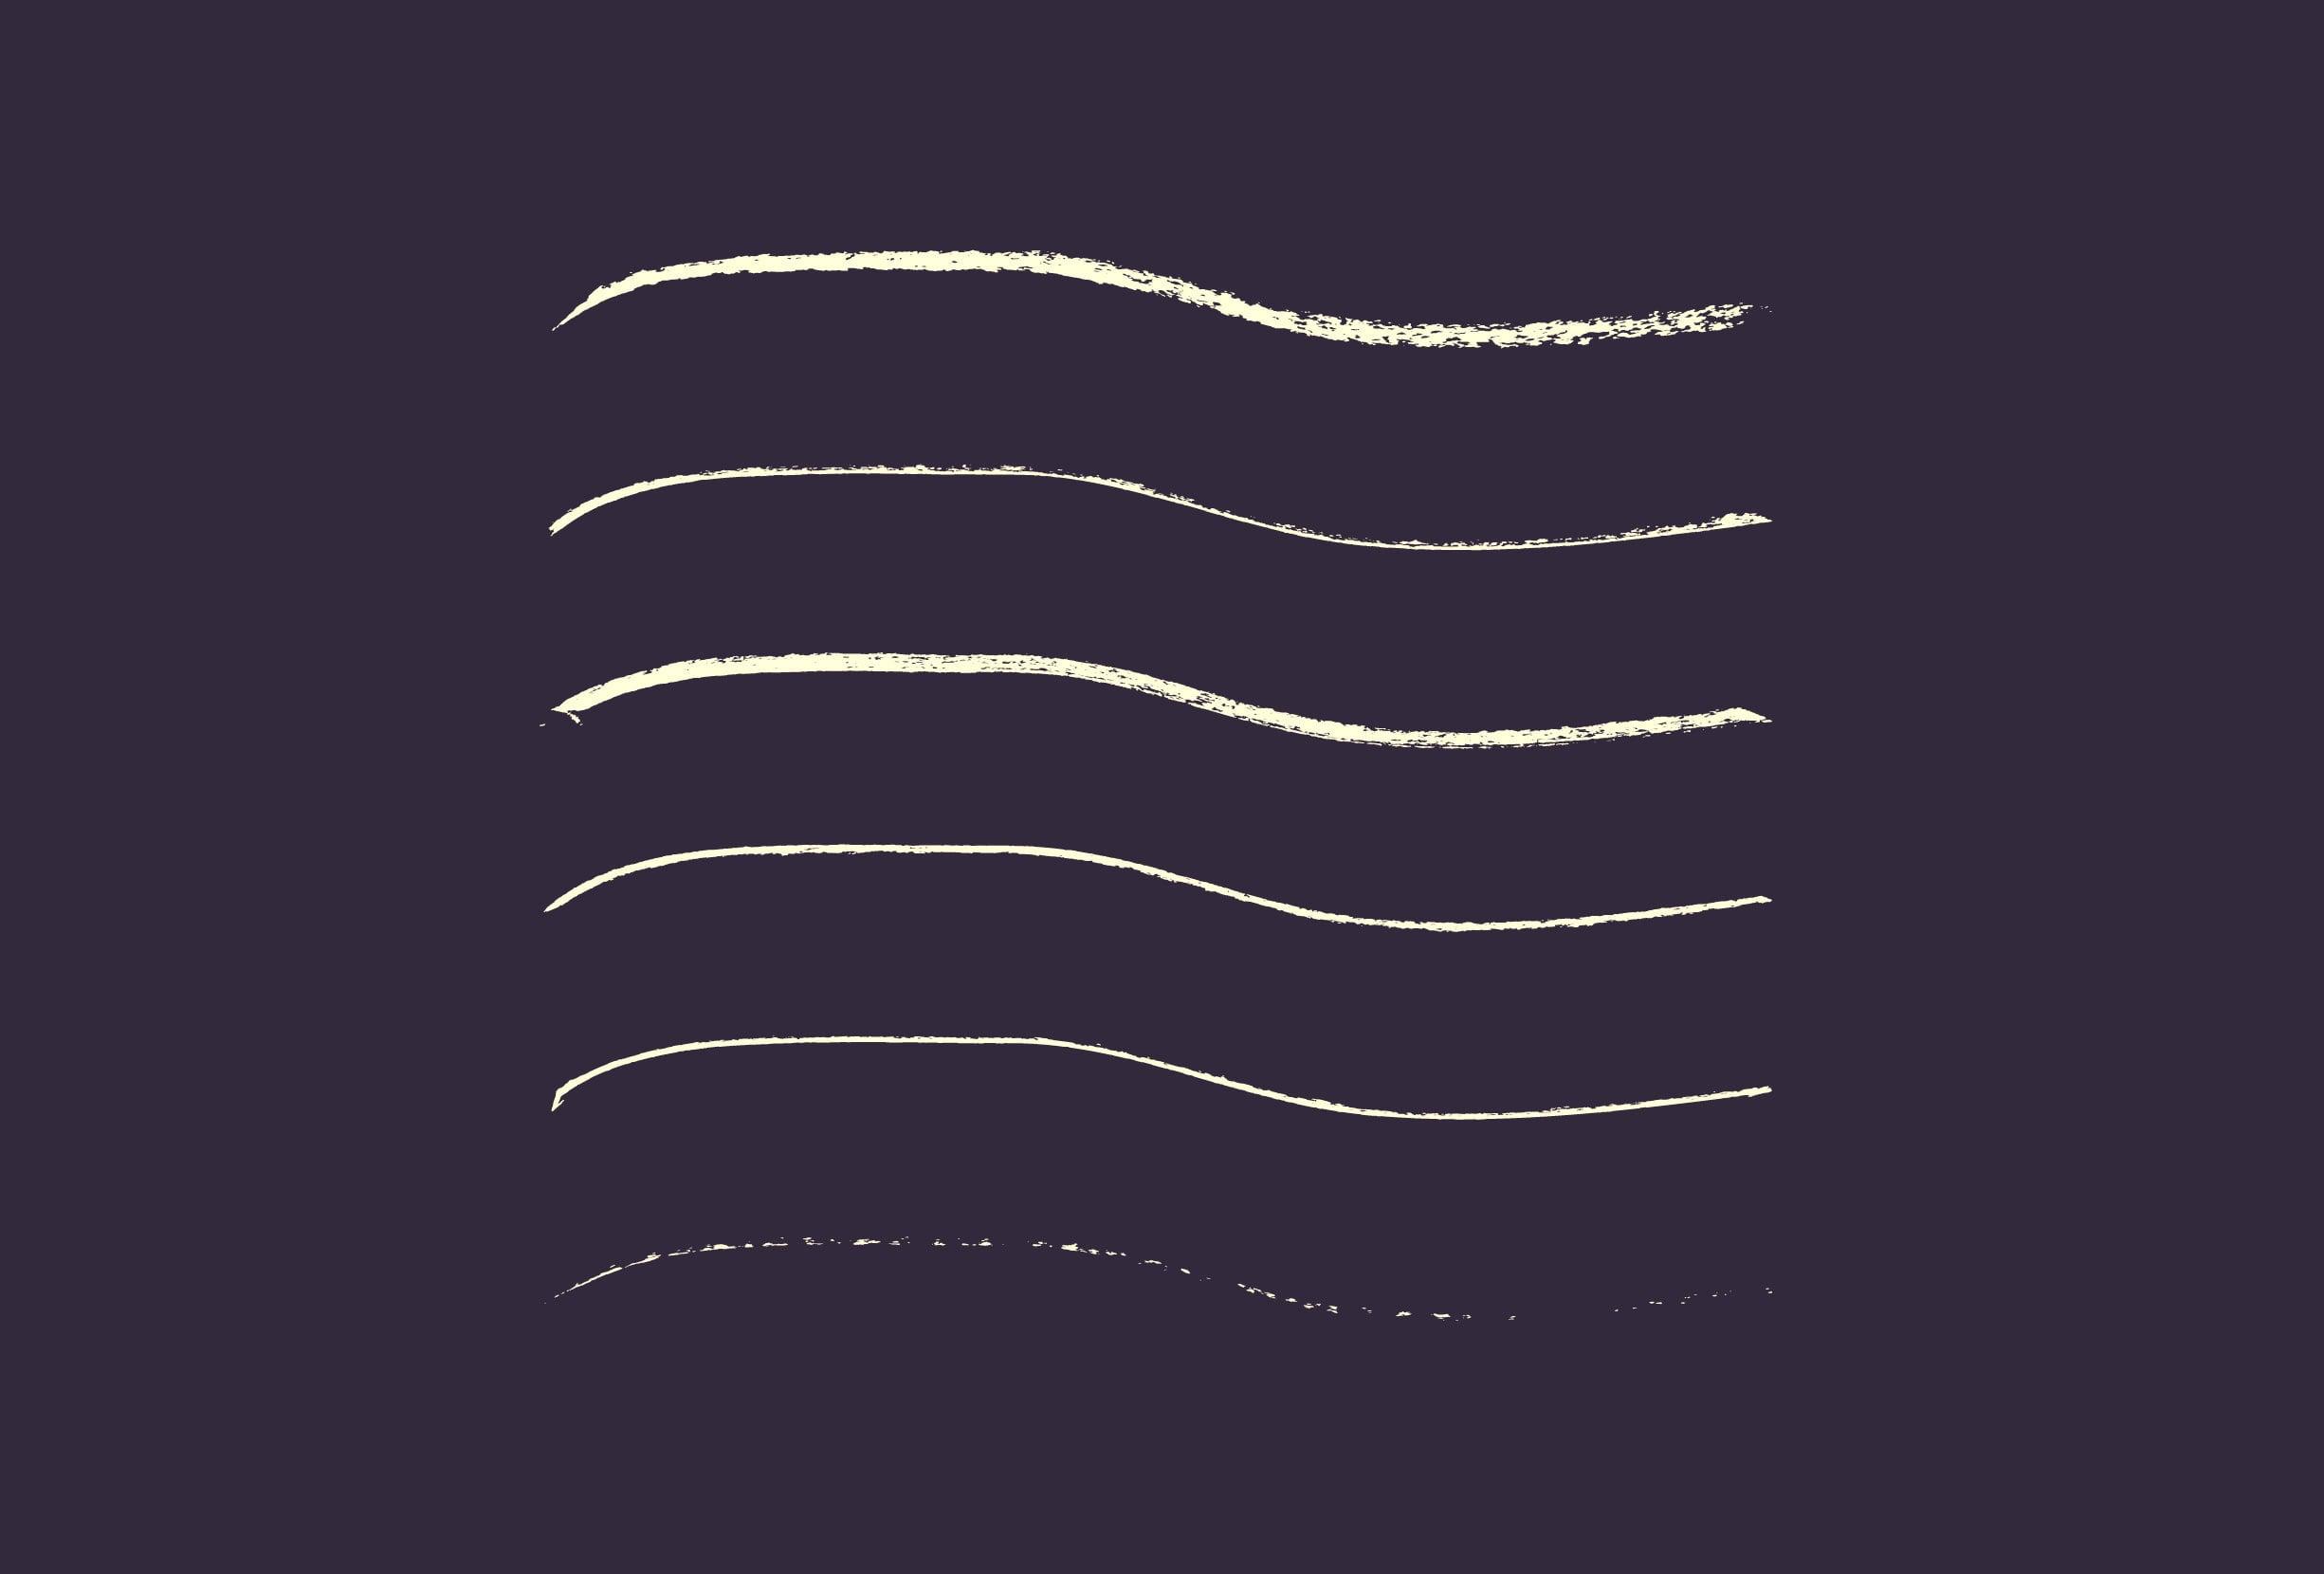 30 Best Line Art Illustrator Brushes (Wax Crayons) - brushes presentation 4 0